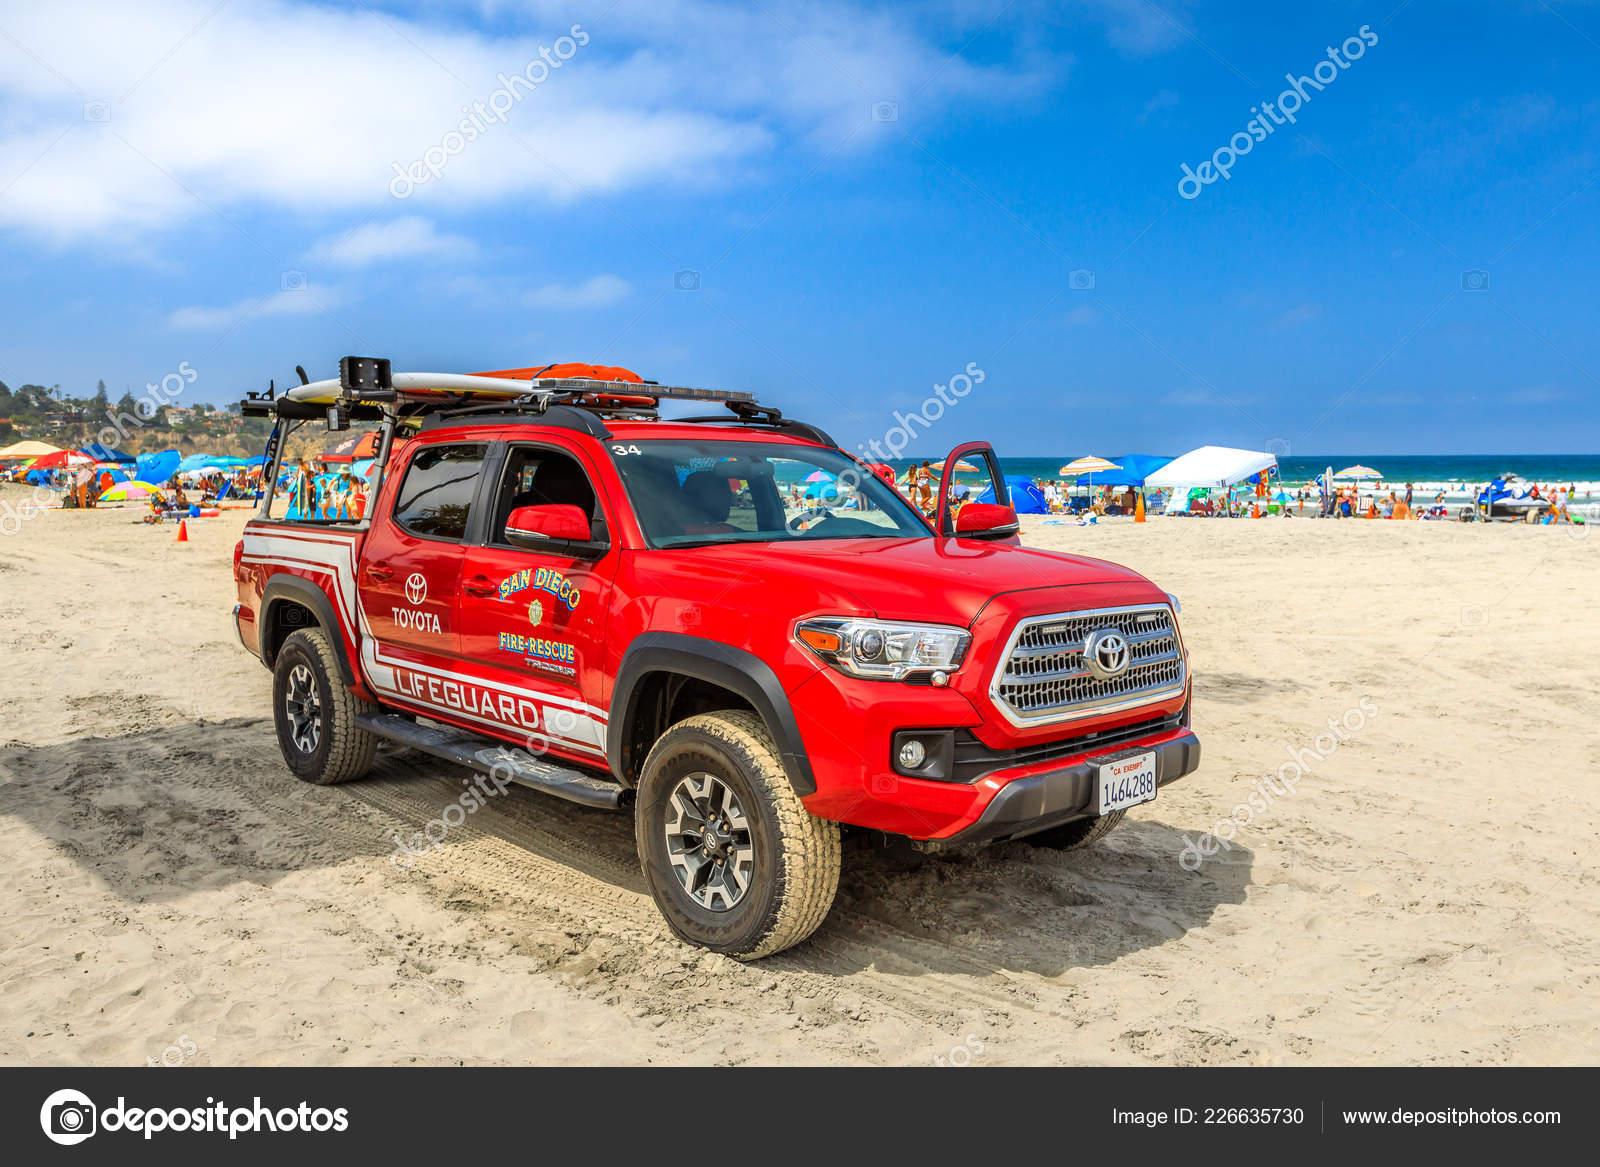 San Diego Beach fire-rescue – Stock Editorial Photo